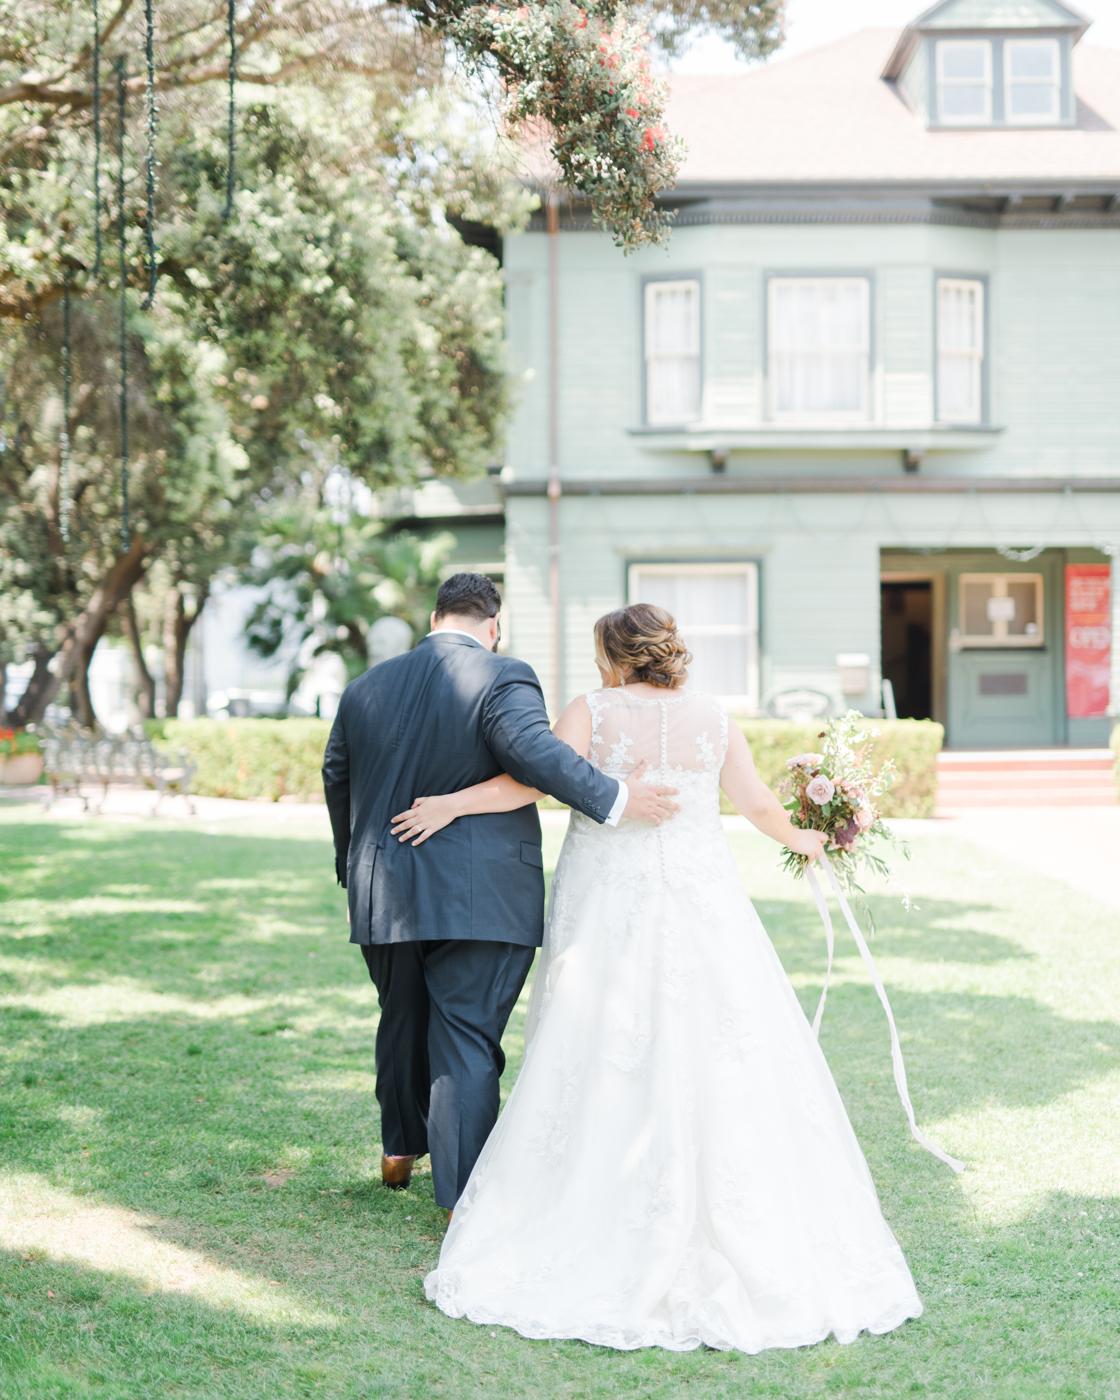 AKP_The_Victorian_Santa_Monica_Wedding_Photographer_Los_Angeles-17.jpg